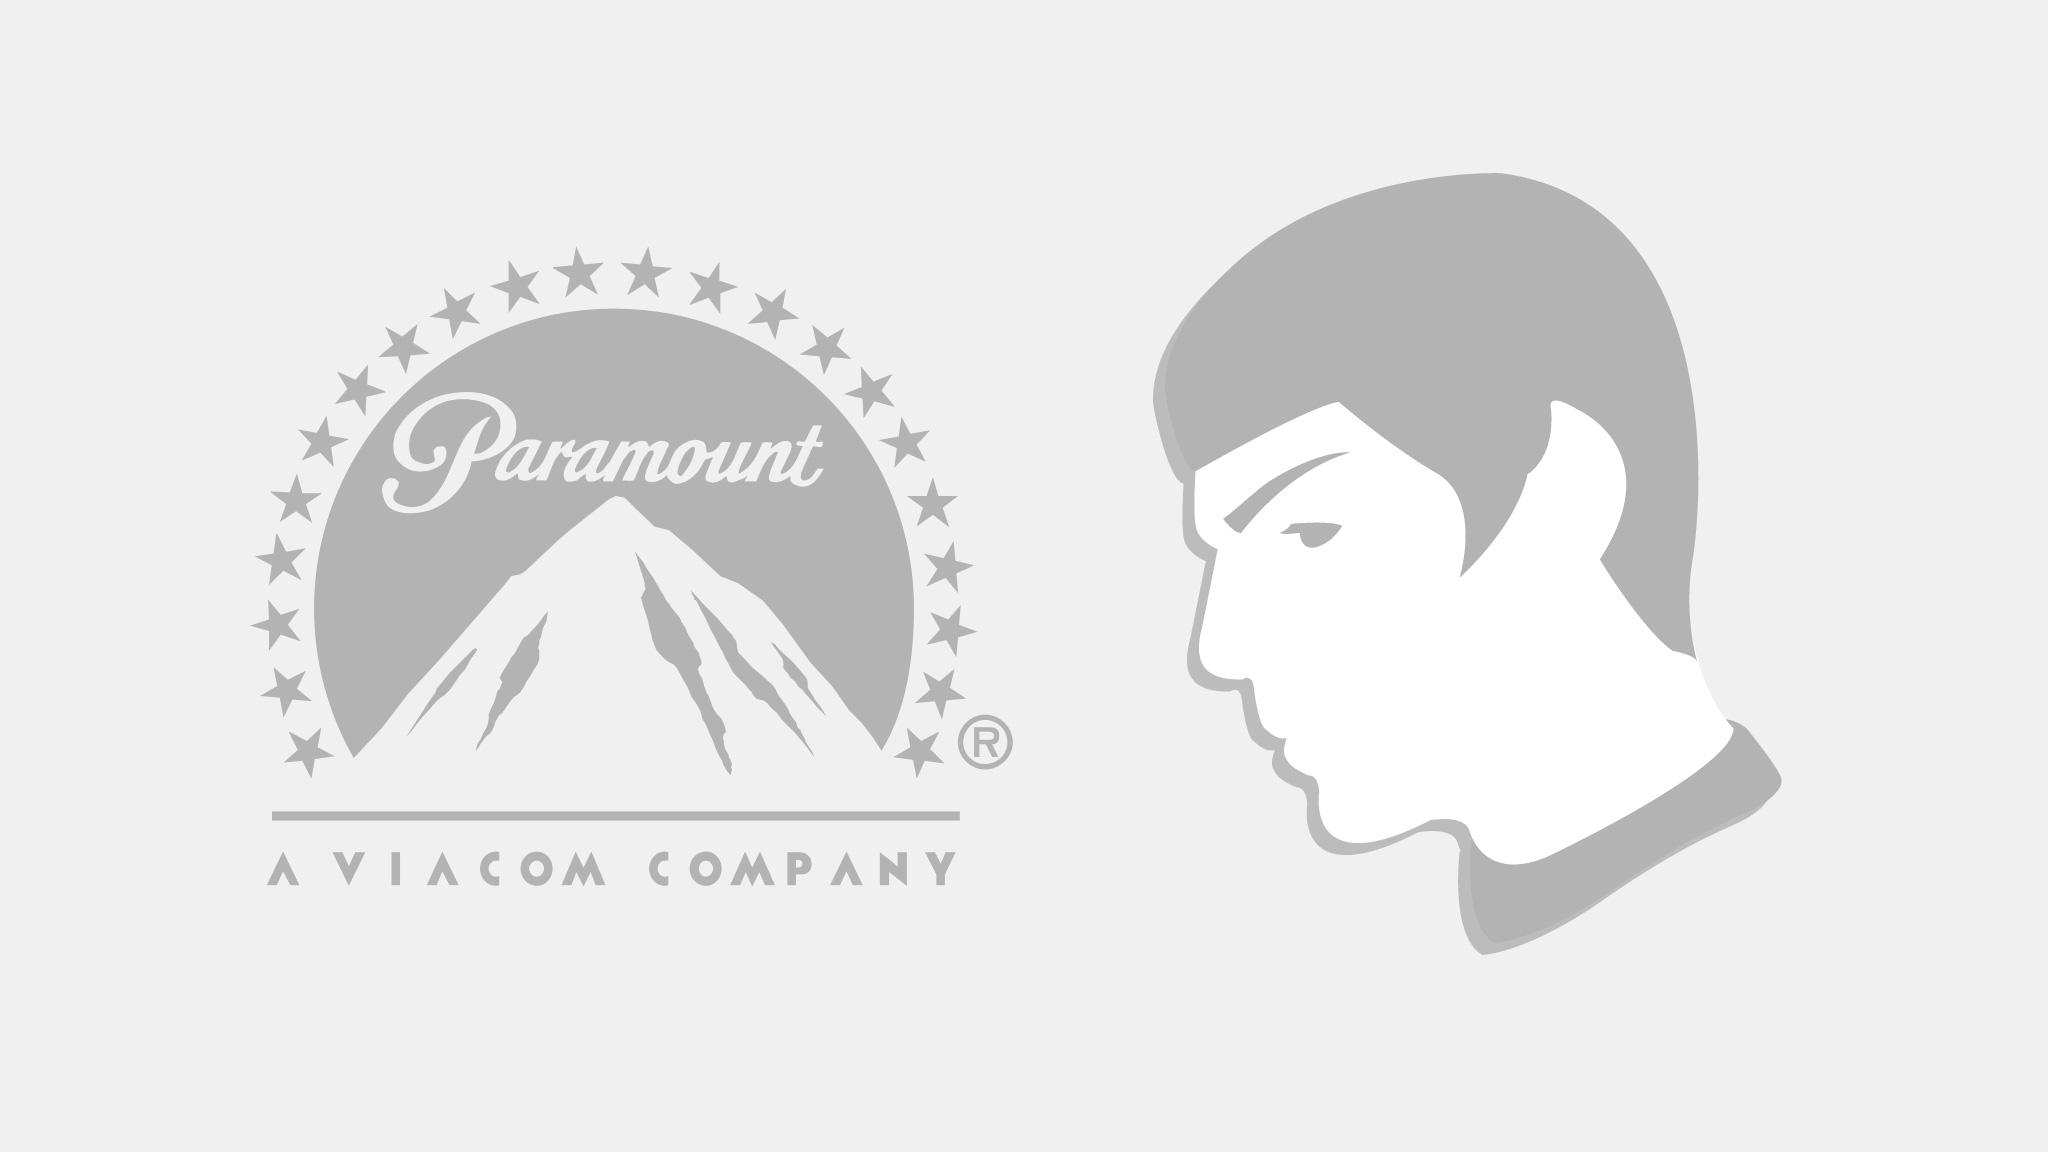 Paramount Studios: Social Engagement & Advanced Technology